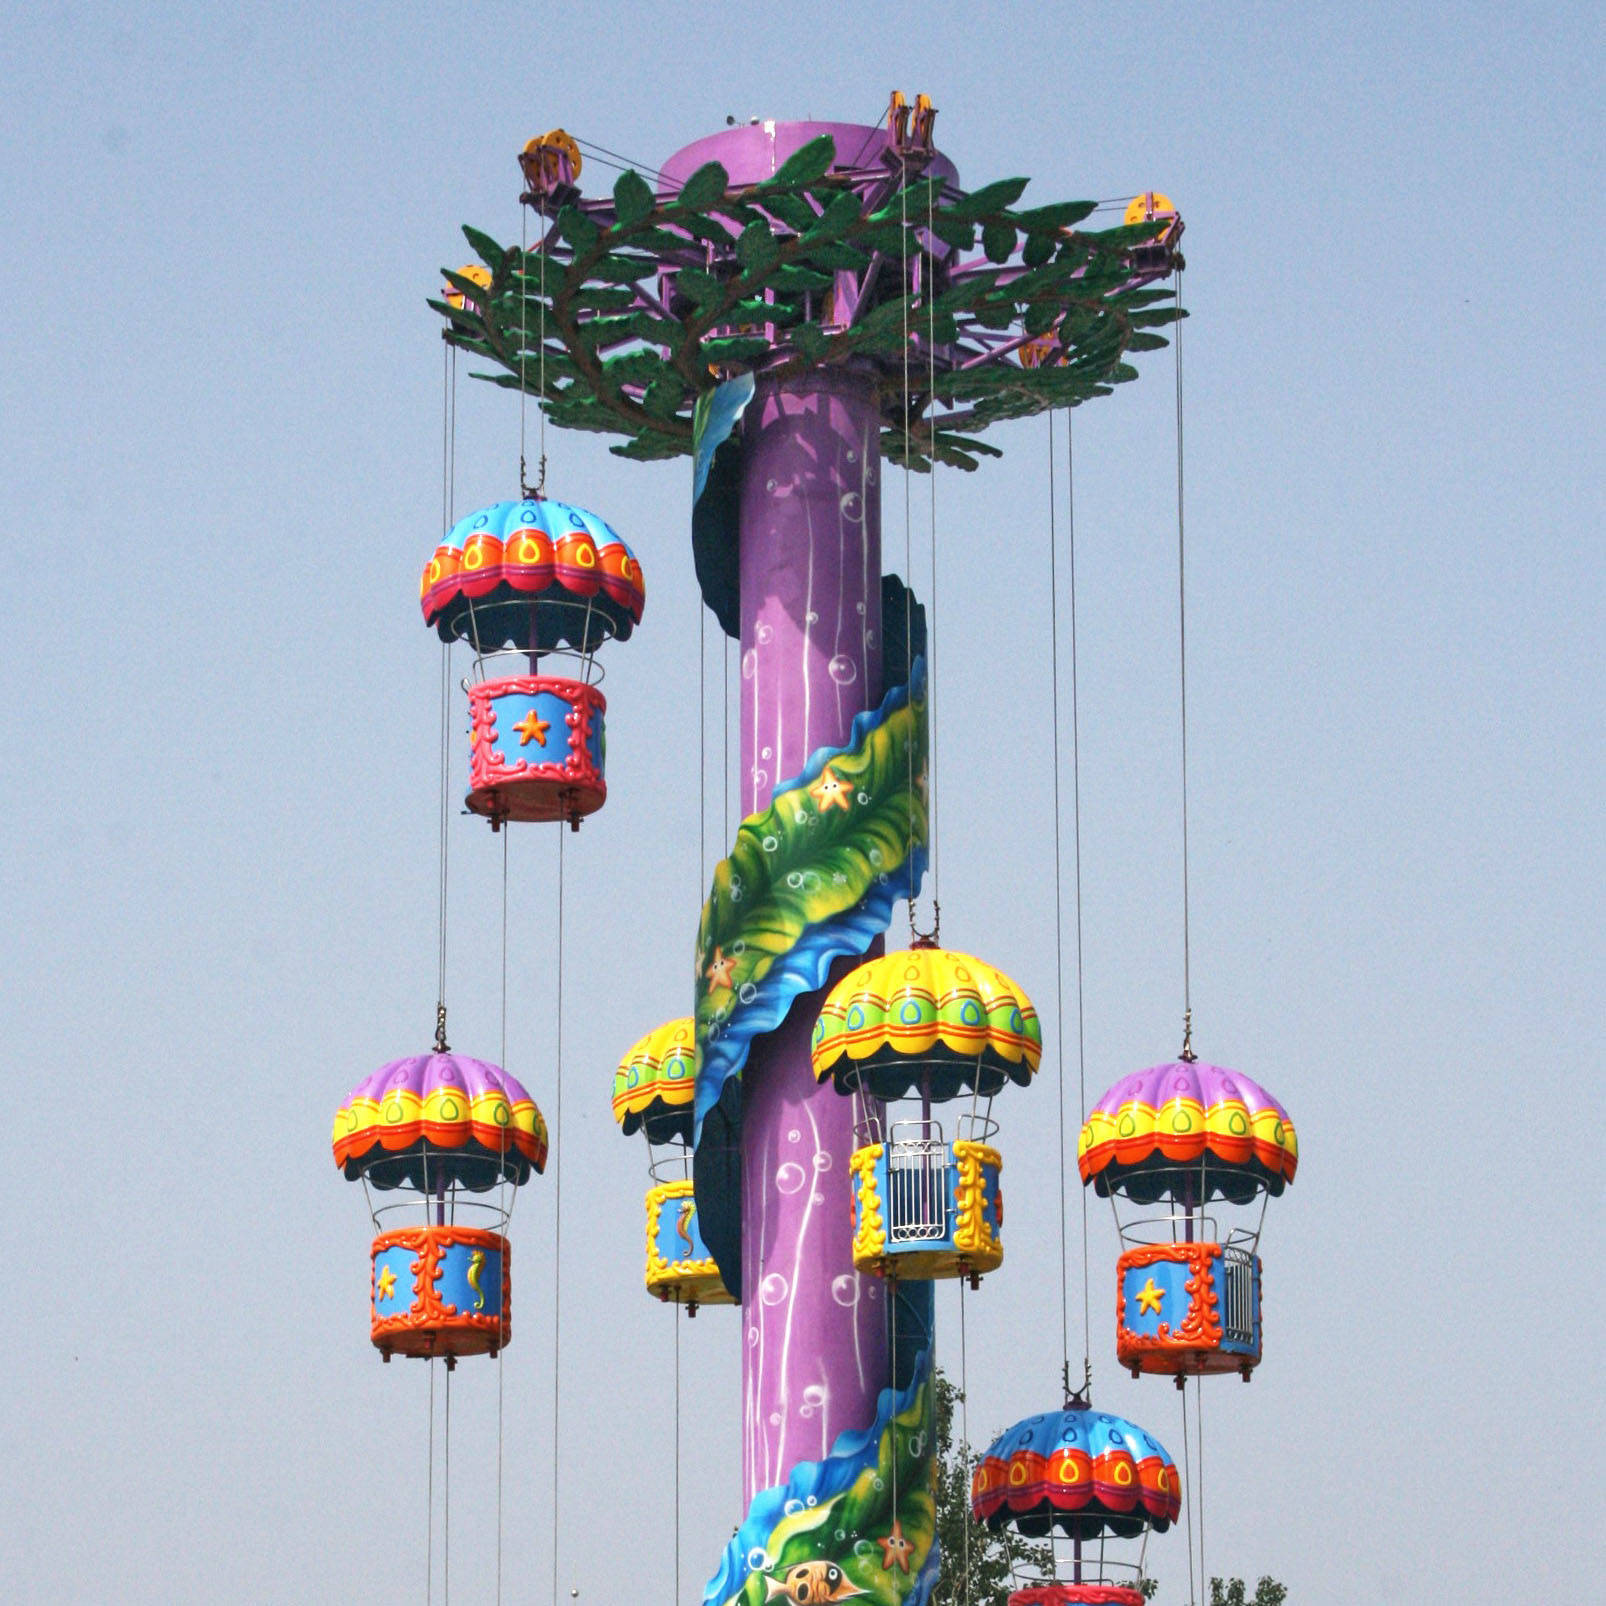 Freefall Ride Parachute Amusement Park RideTST-18A